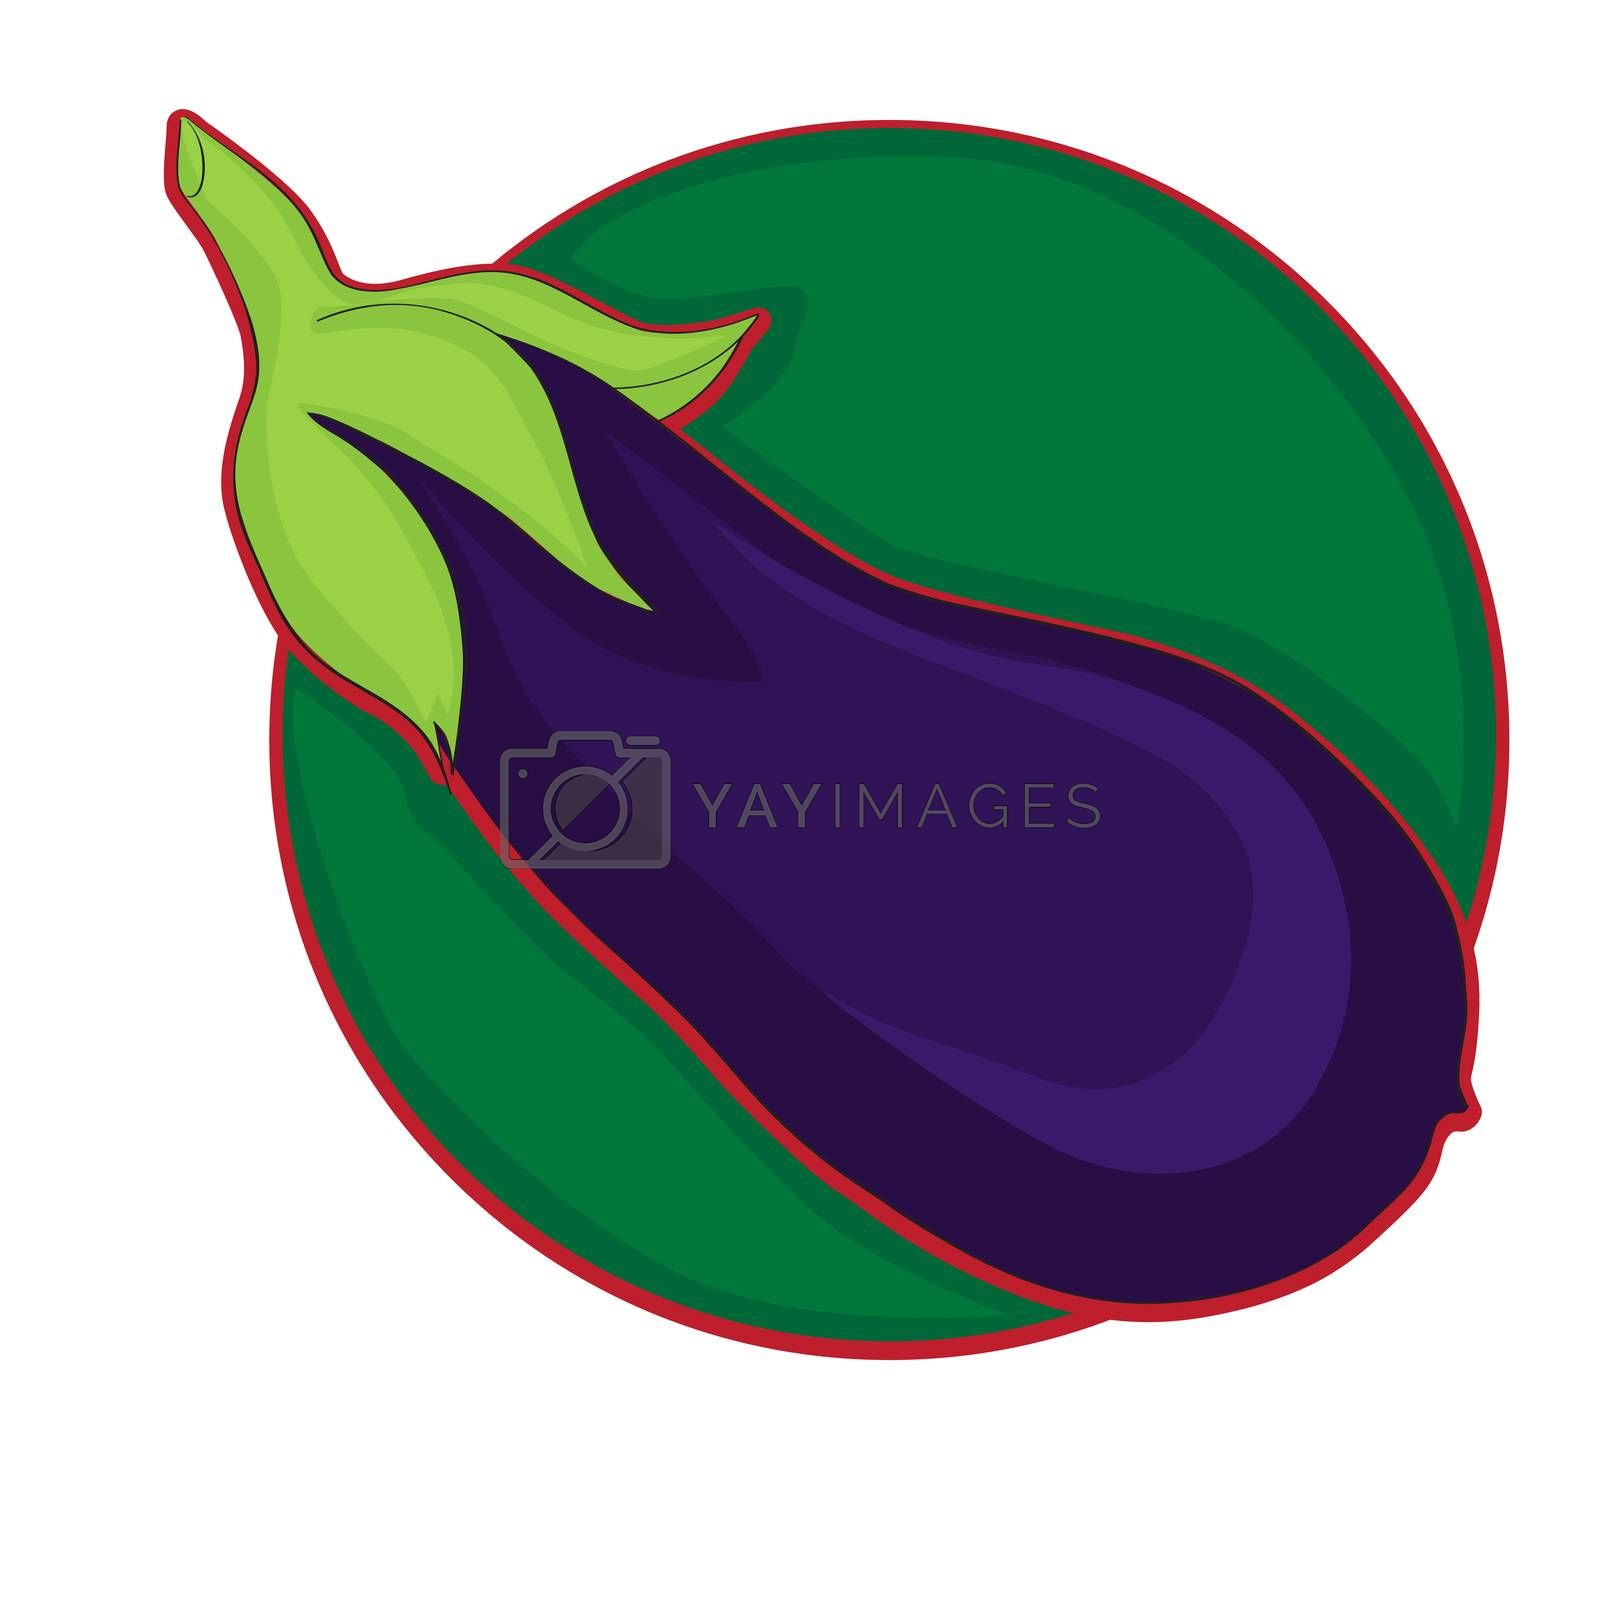 Eggplant clip art, doodle colored illustration on white